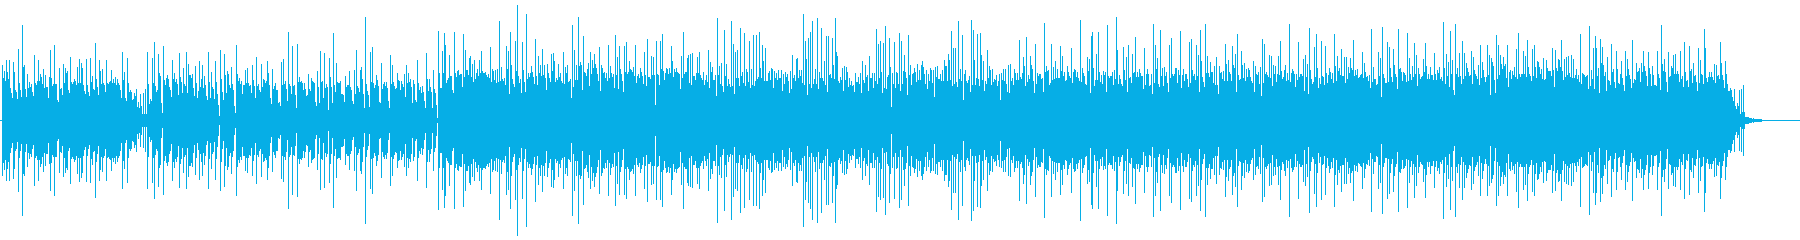 Eピアノやキーボードが際立つJAZZ調の再生済みの波形